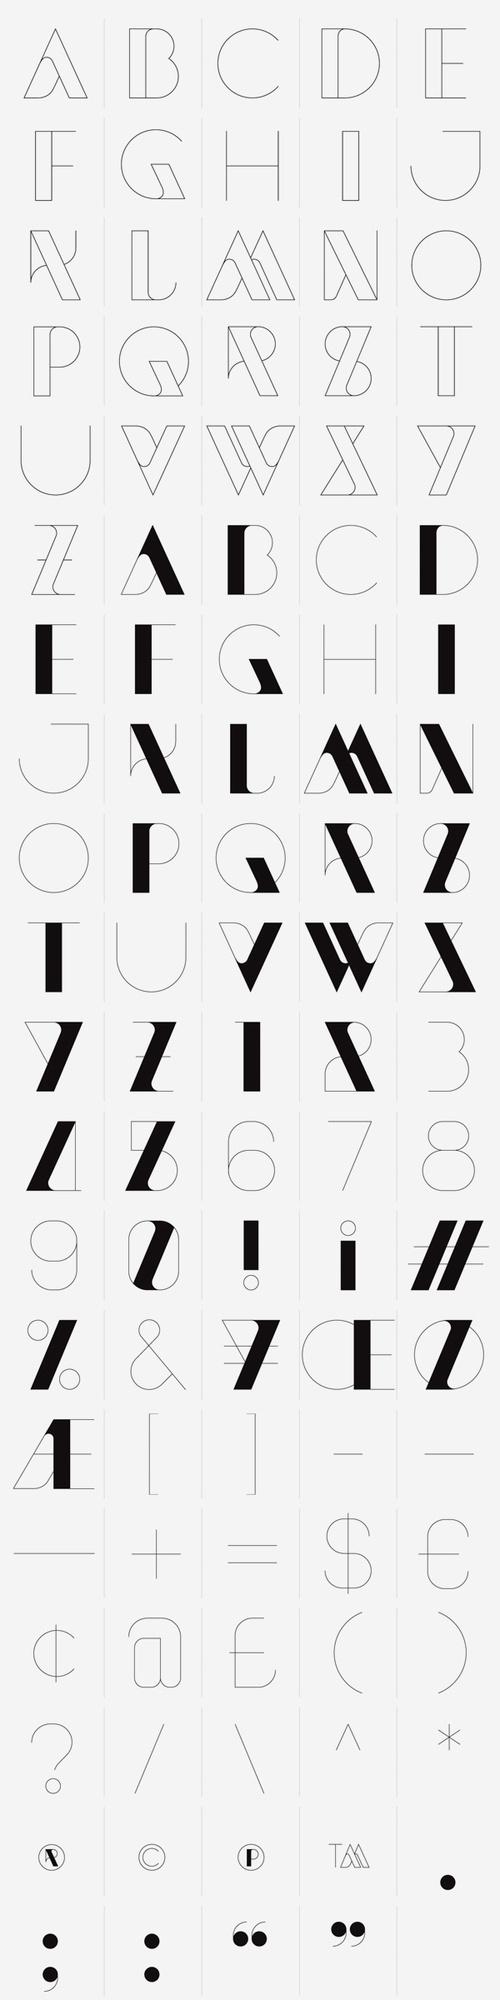 NewModern Typeface Design by Sawdust